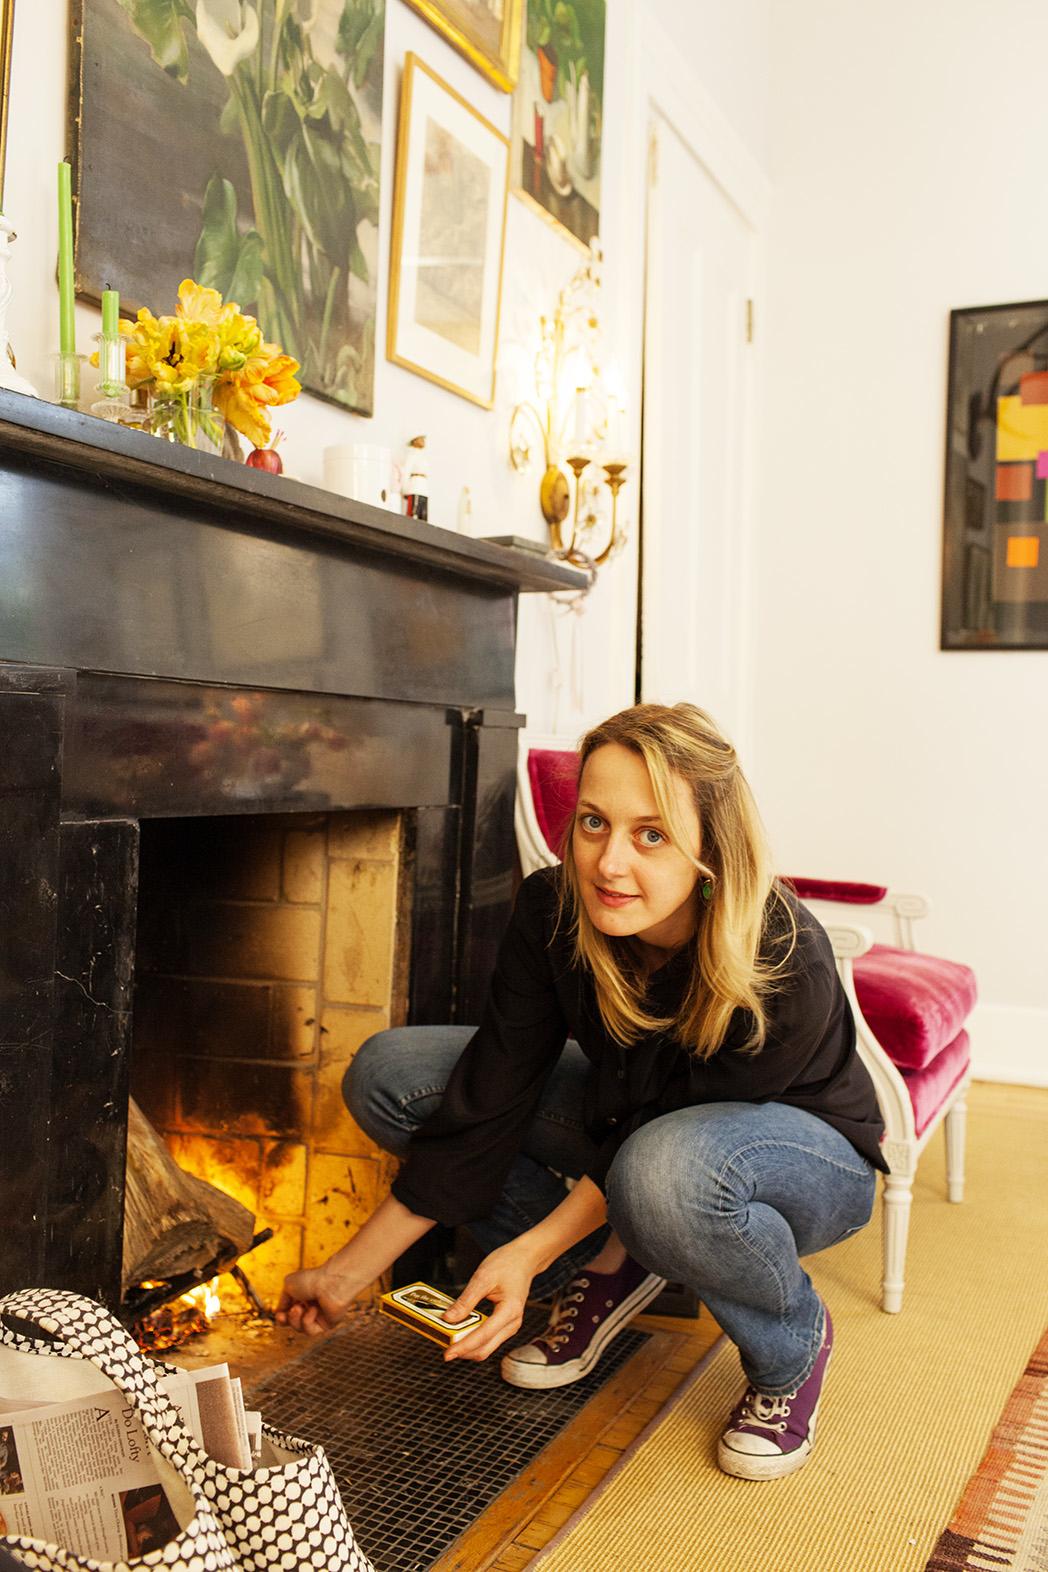 Rita-konig-new-york-apartment-the-selby-9